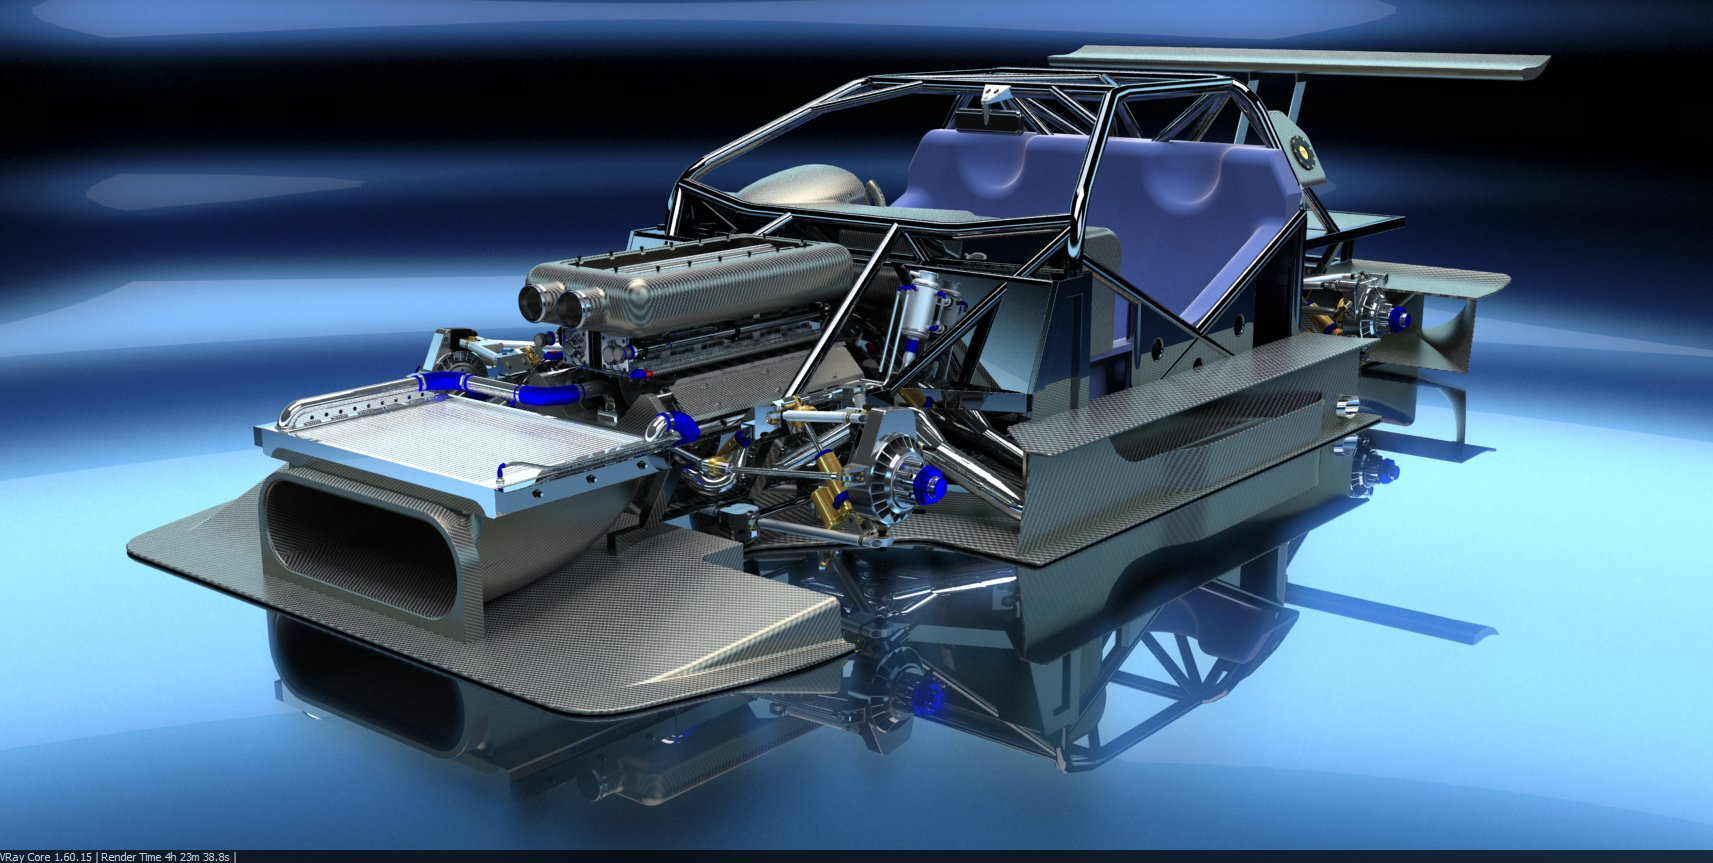 PEASNELL RACING DESIGN 575 GTC HILLCLIMB CAR DETAIL (5)